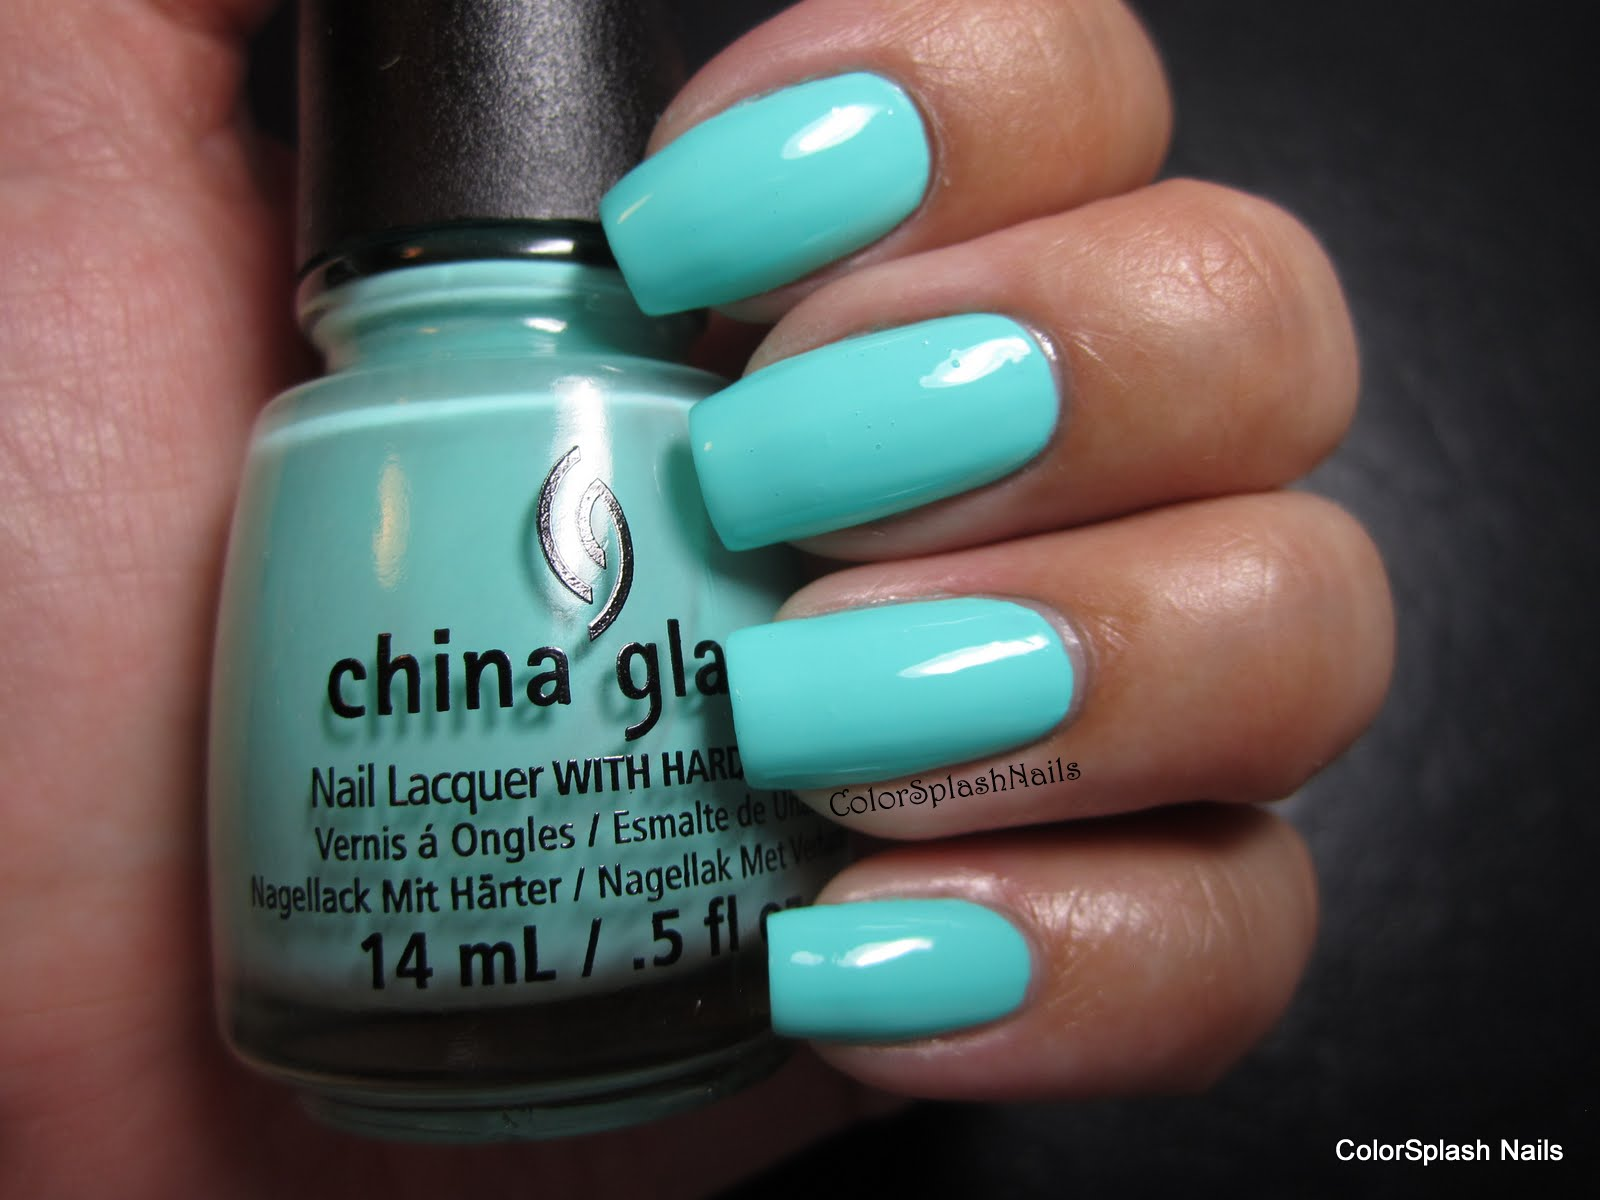 Colorsplash Nails: Black Luna Lacquer New Polishes Preview